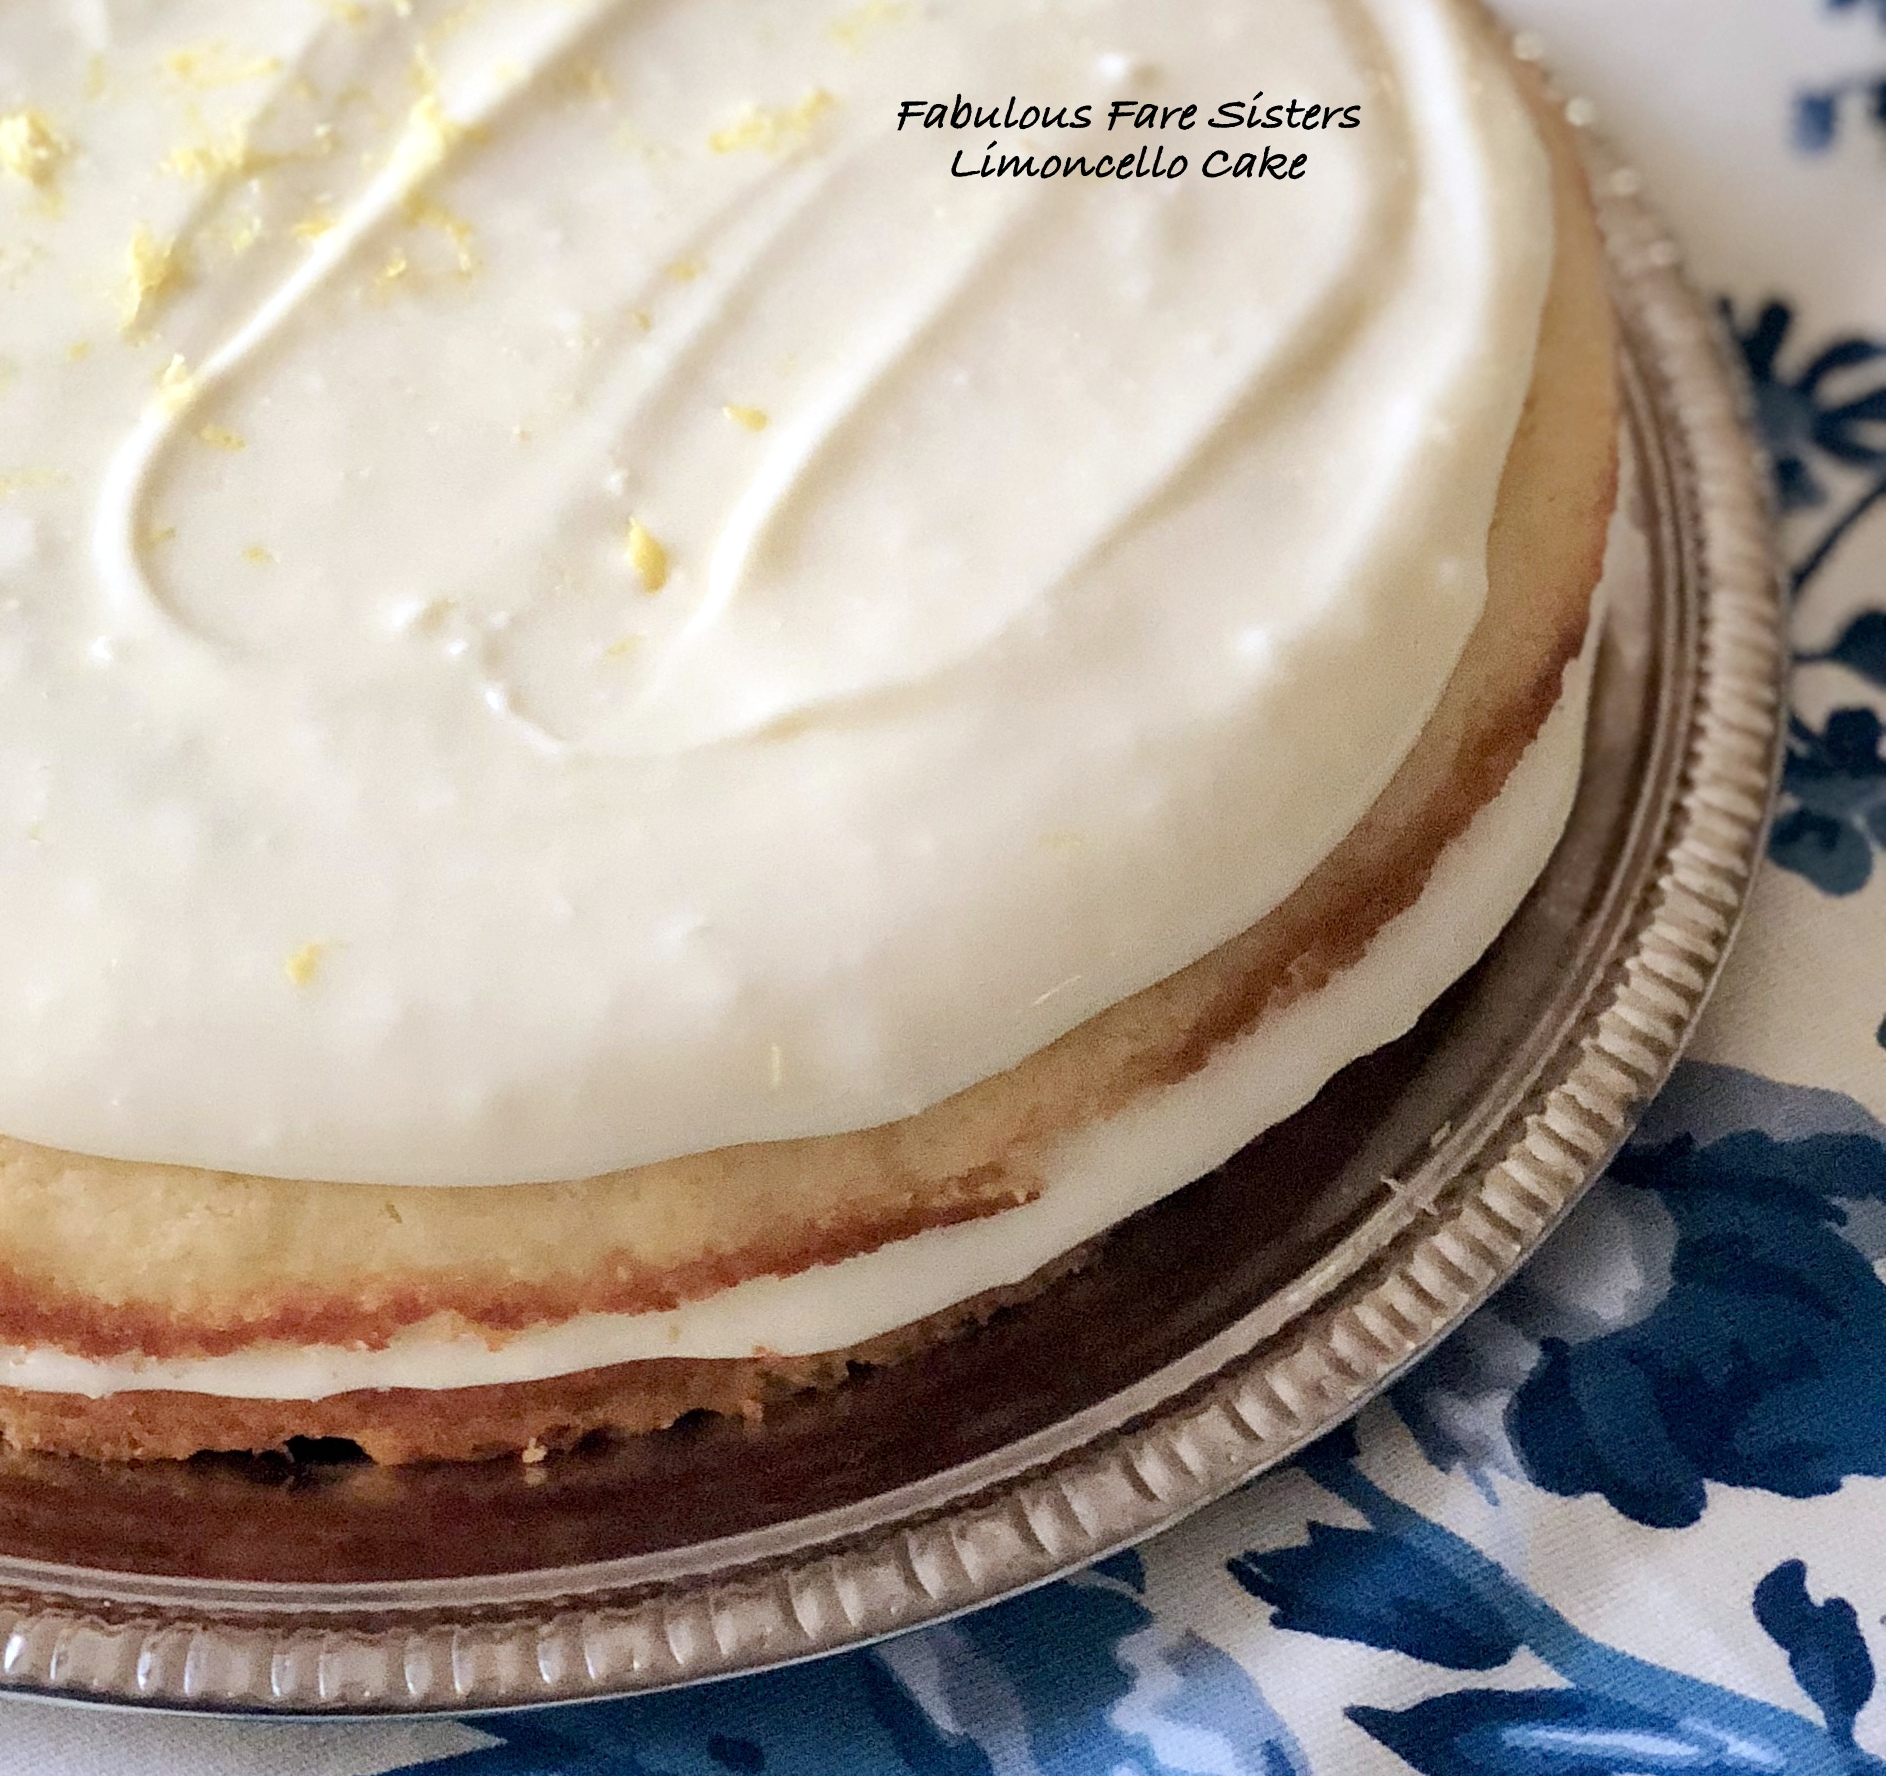 Limoncello Cake Fabulous Fare Sisters